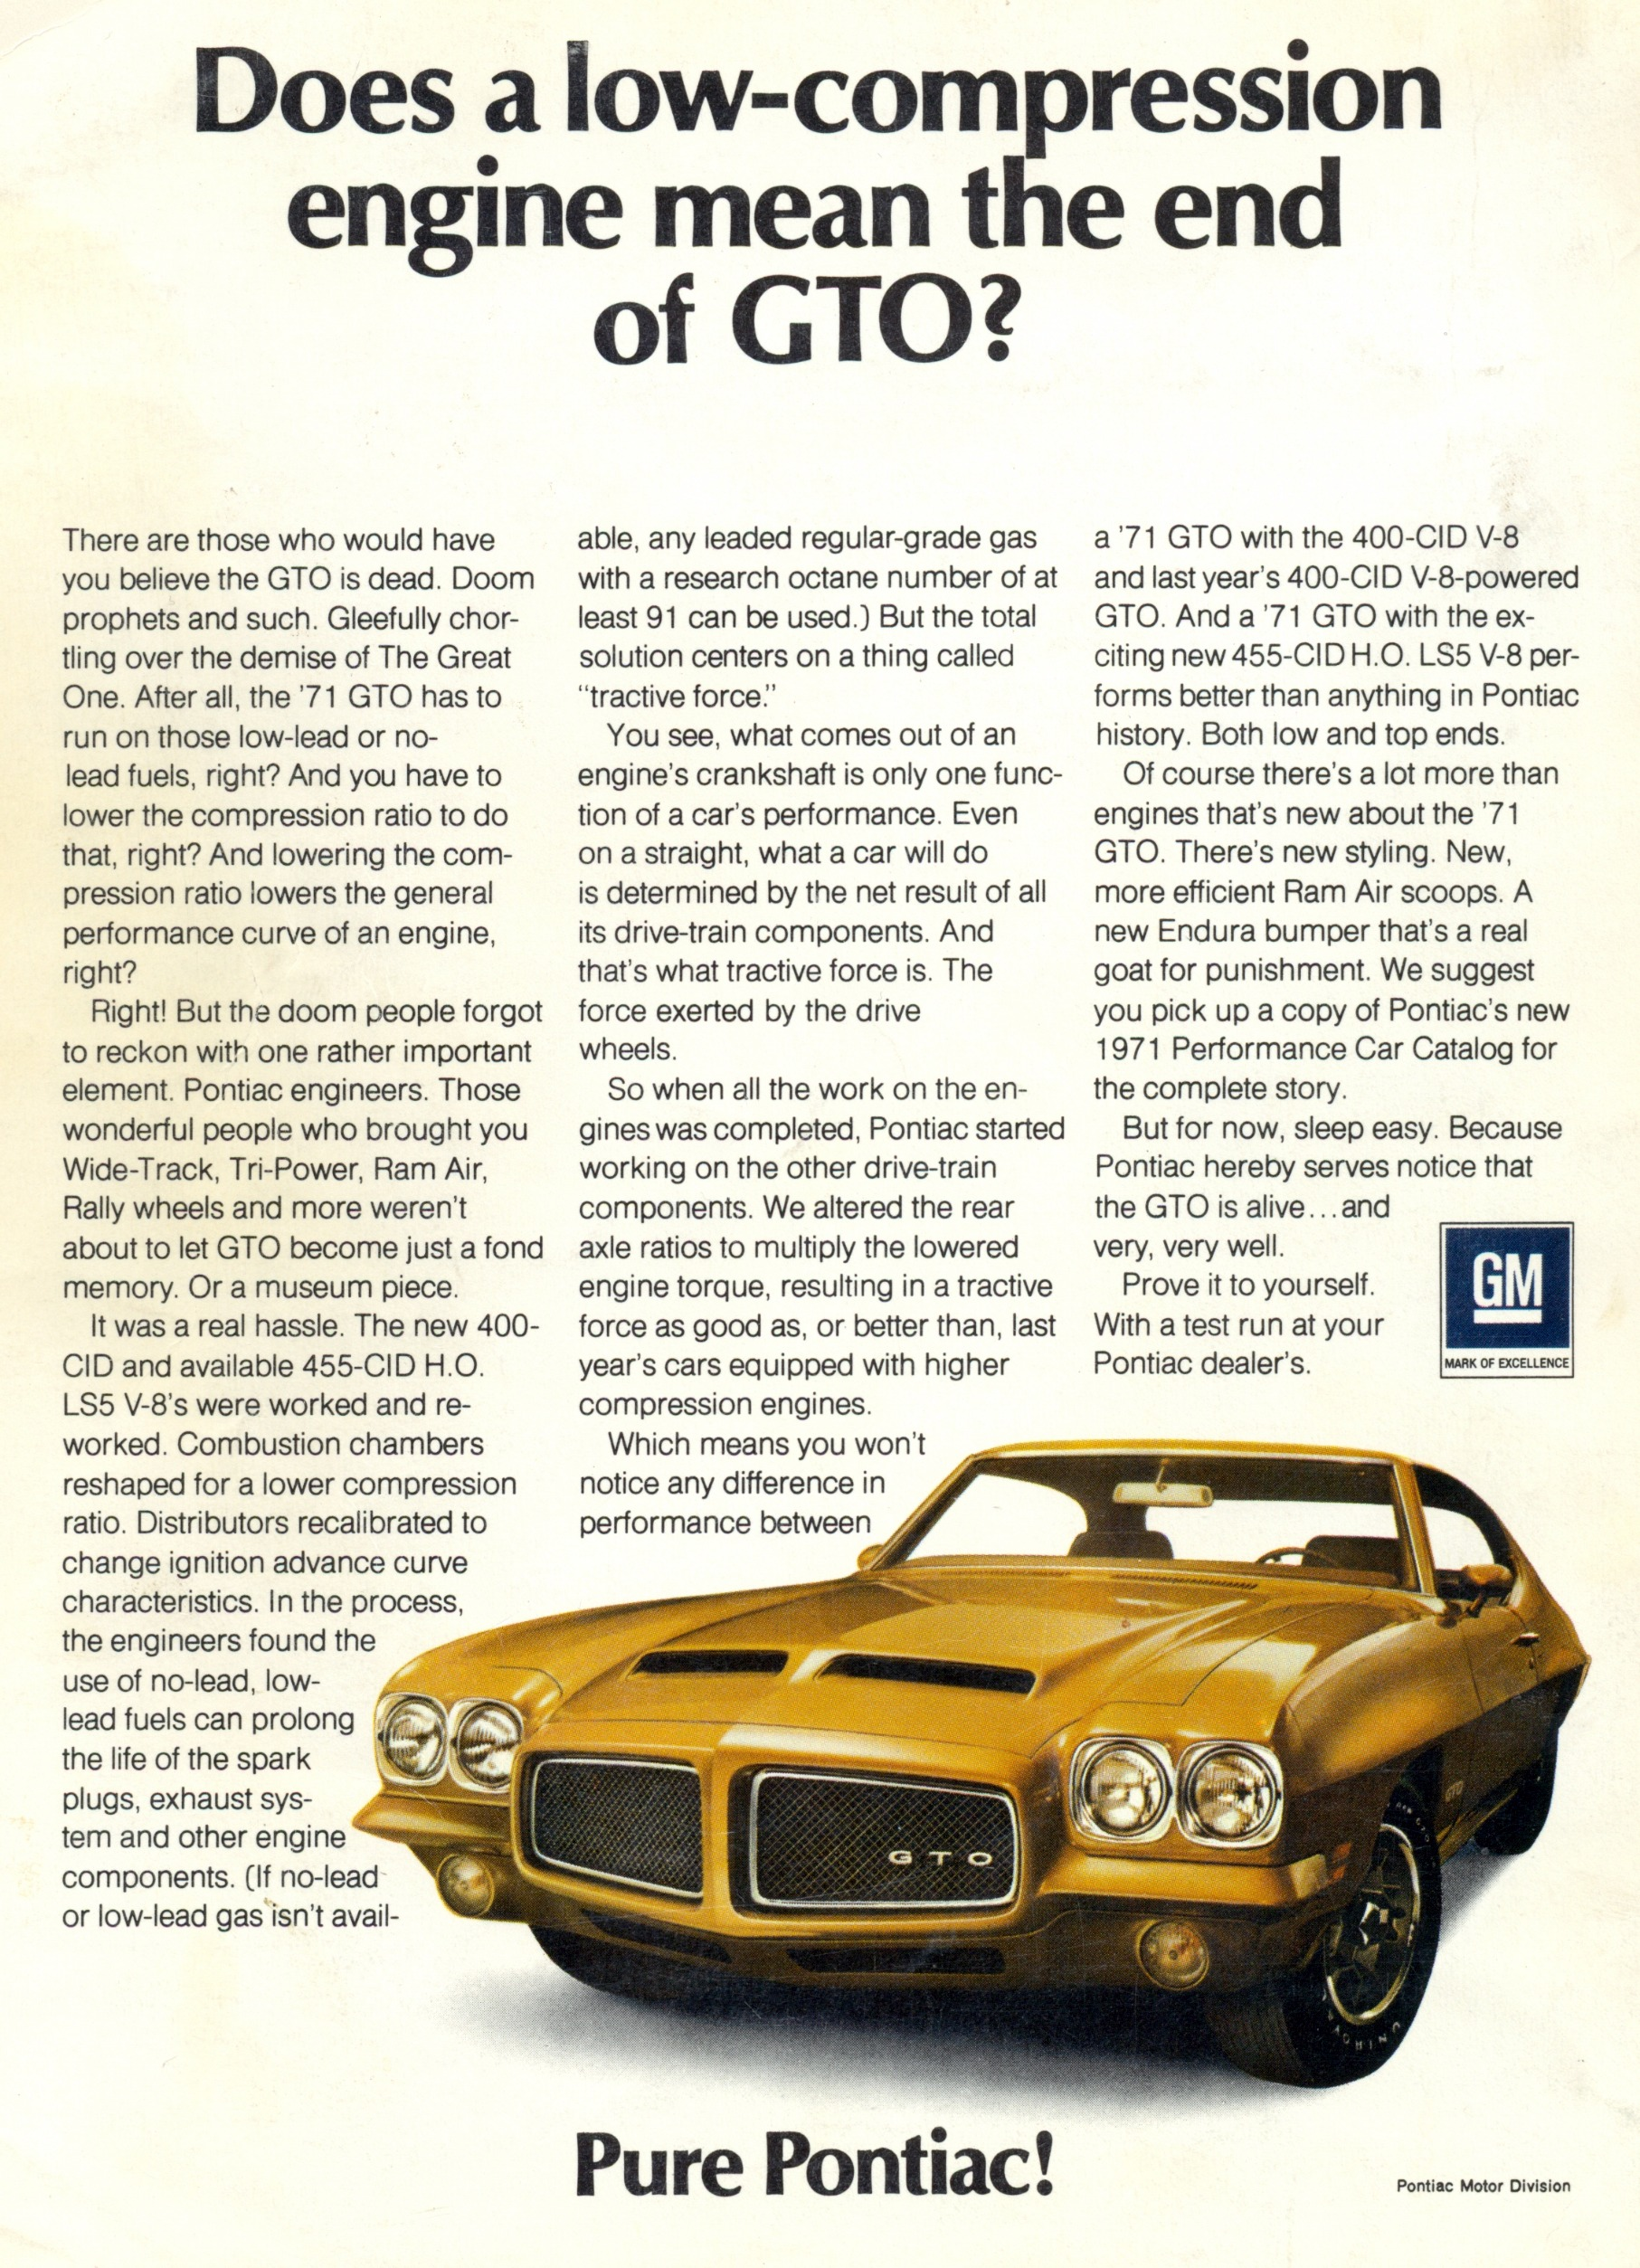 TunnelRam_GTO (11).jpeg